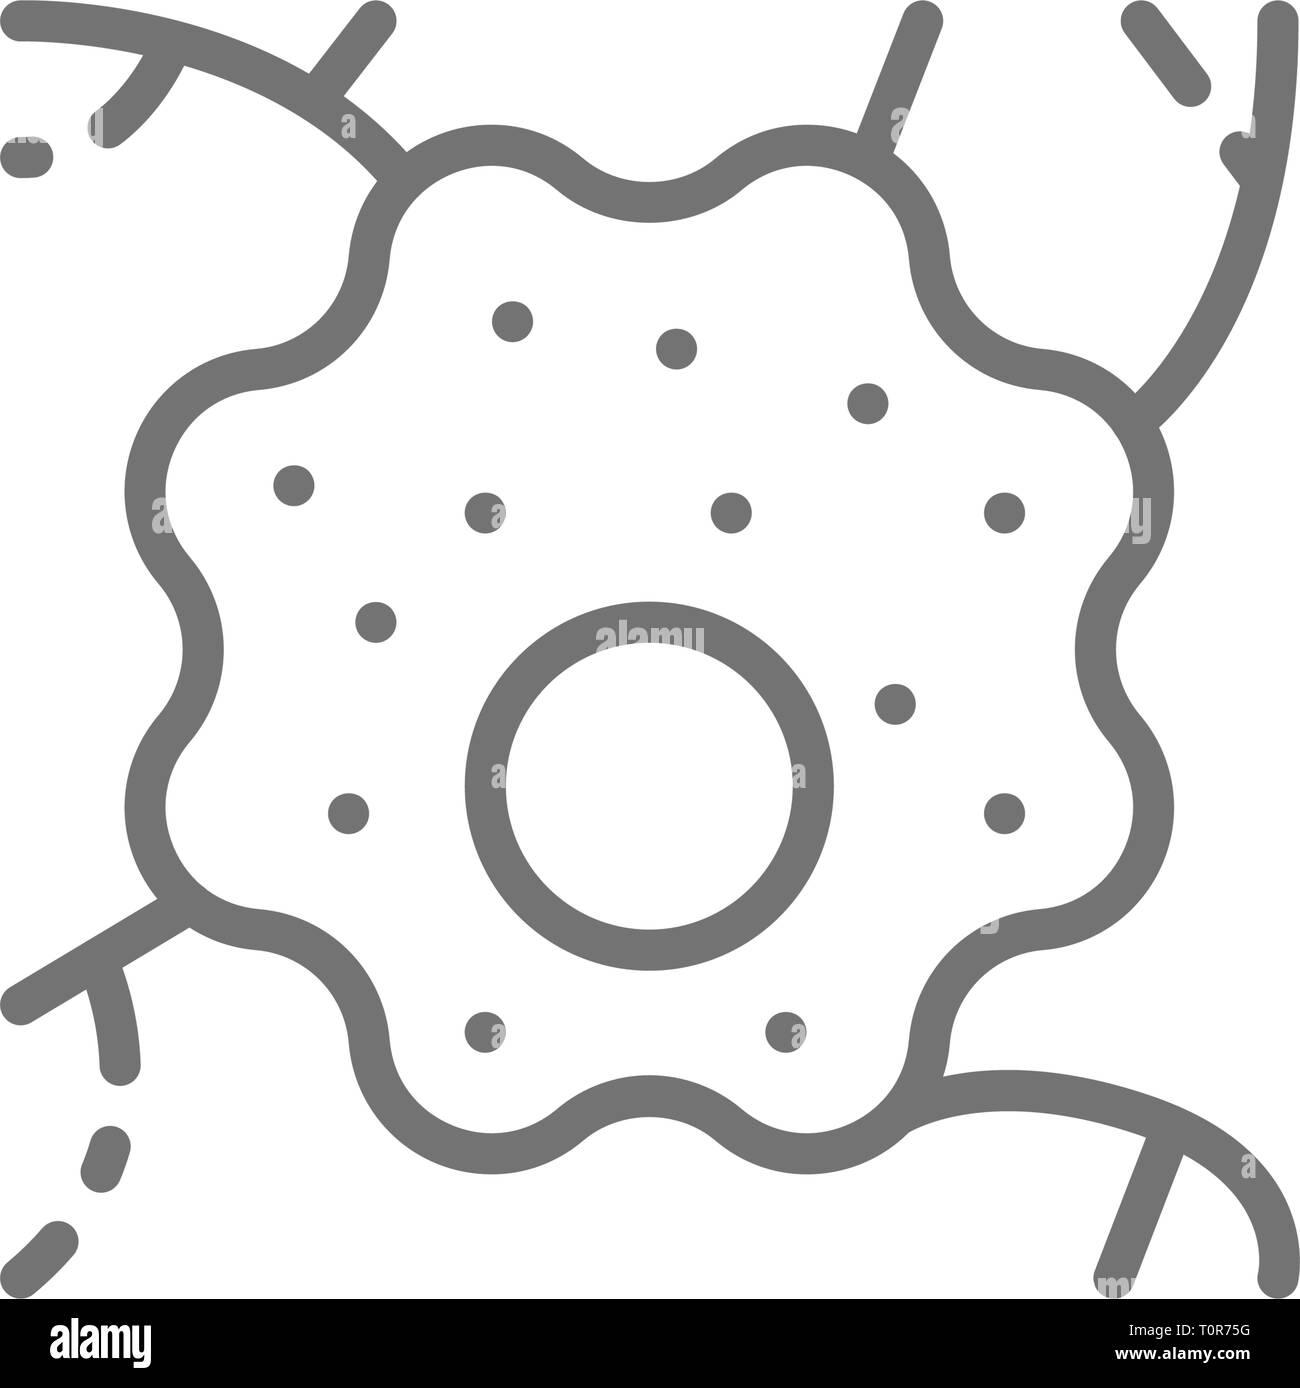 Nerve cell, neuron, human anatomy line icon. - Stock Image